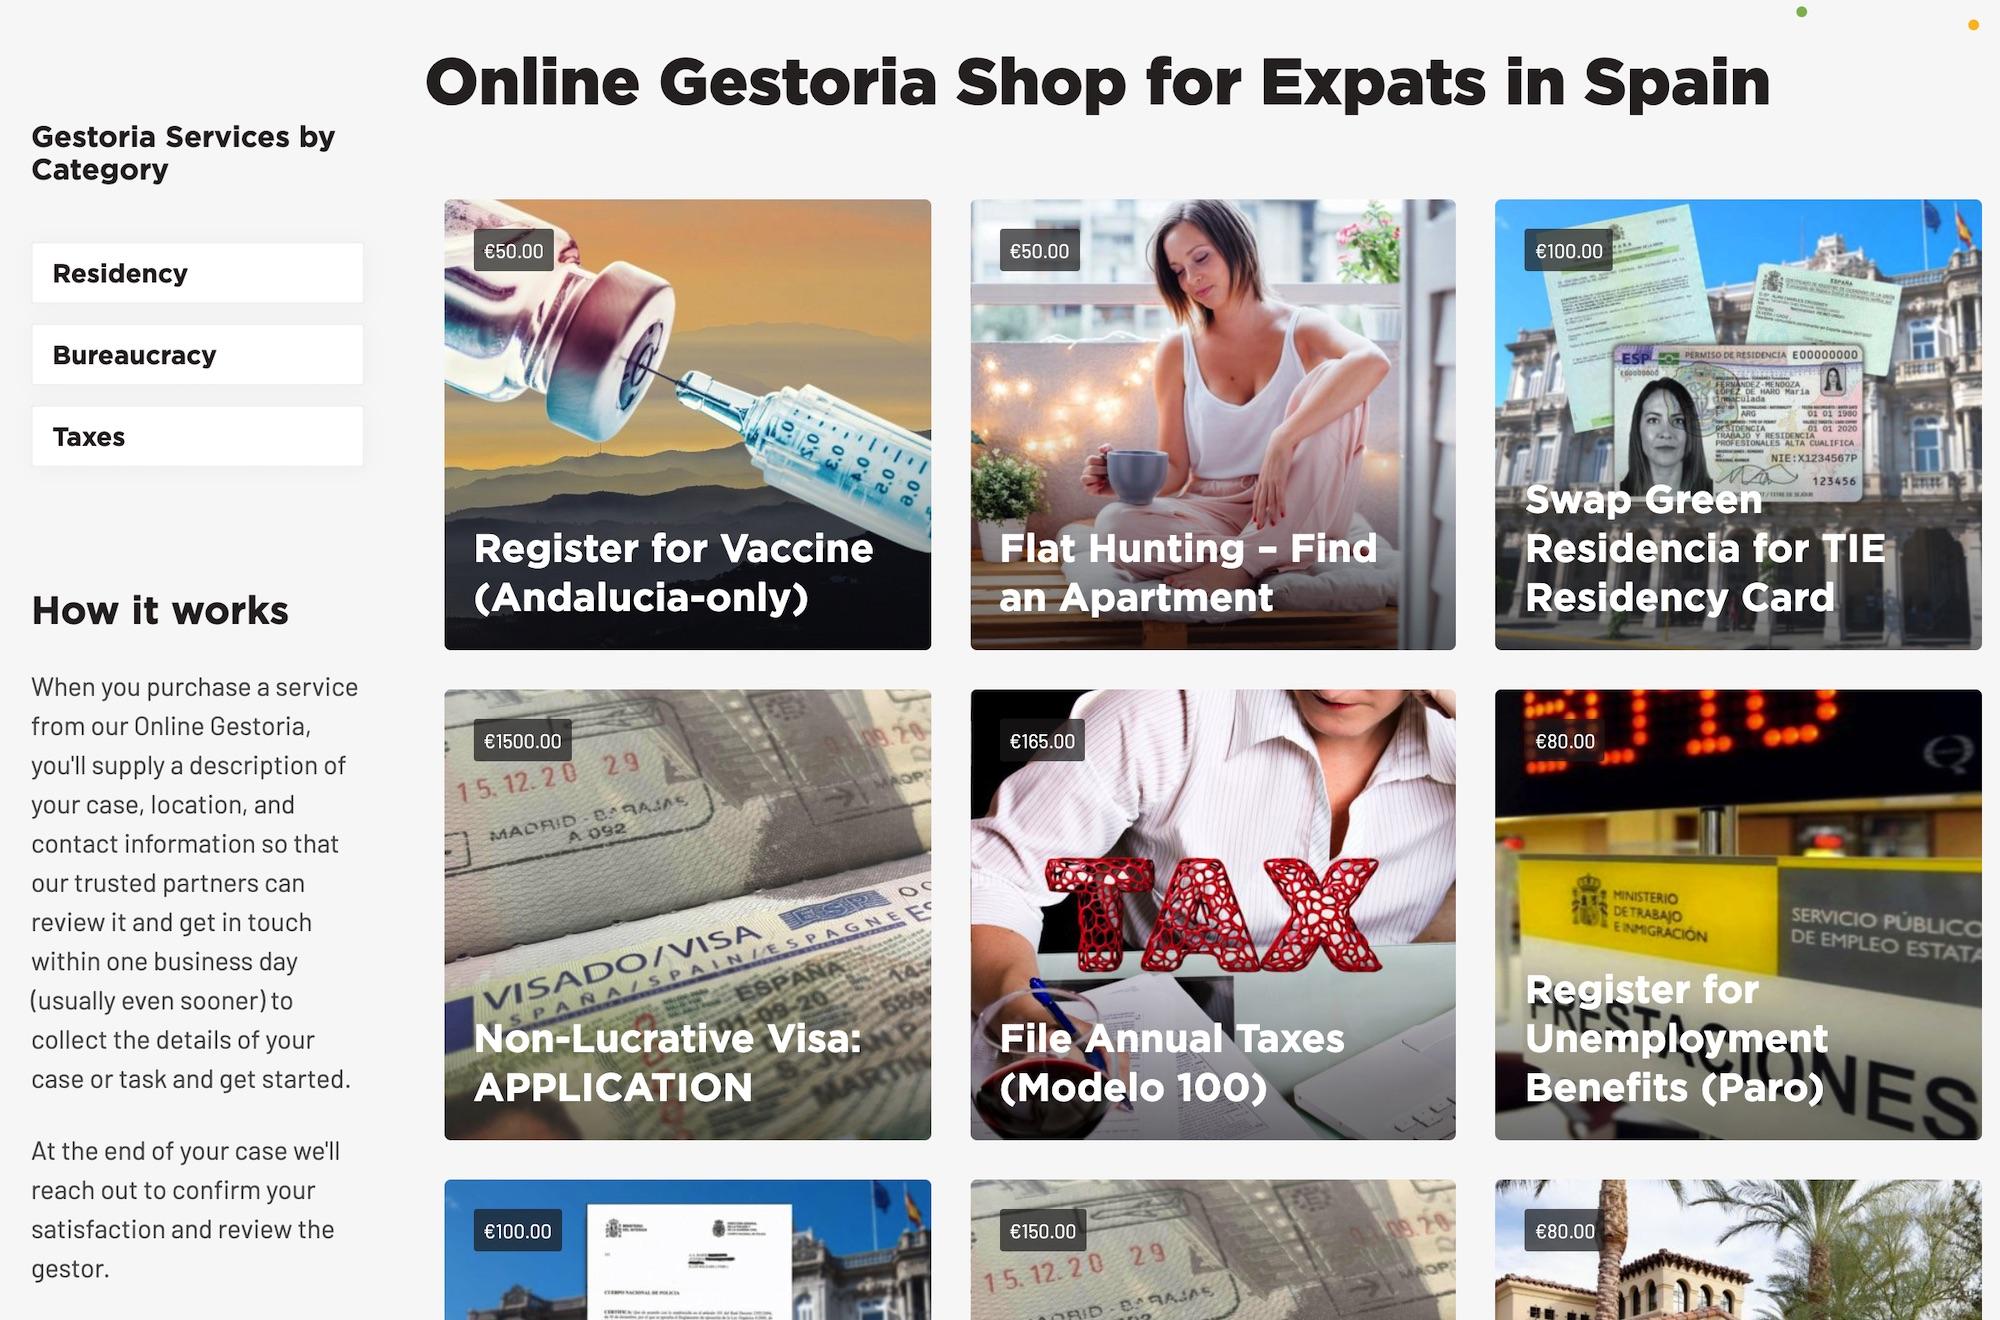 Spain Expat Online Gestoria Shop